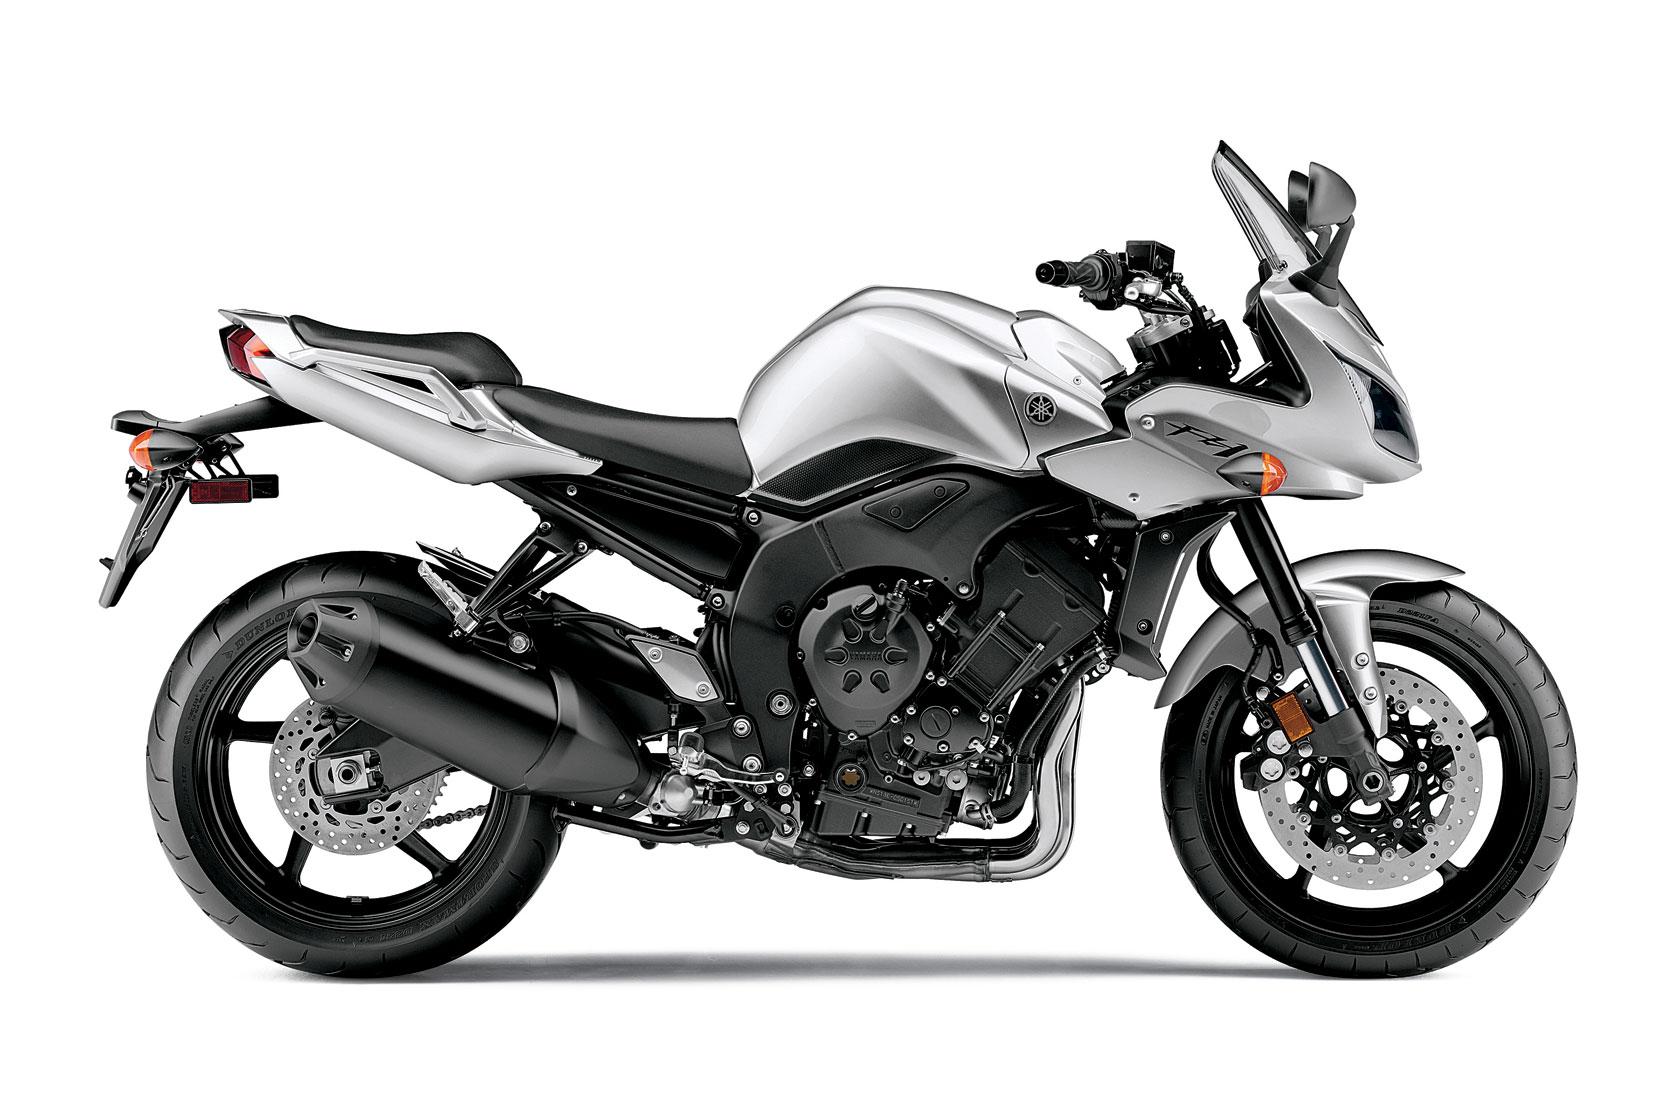 Yamaha Fz1 Specs